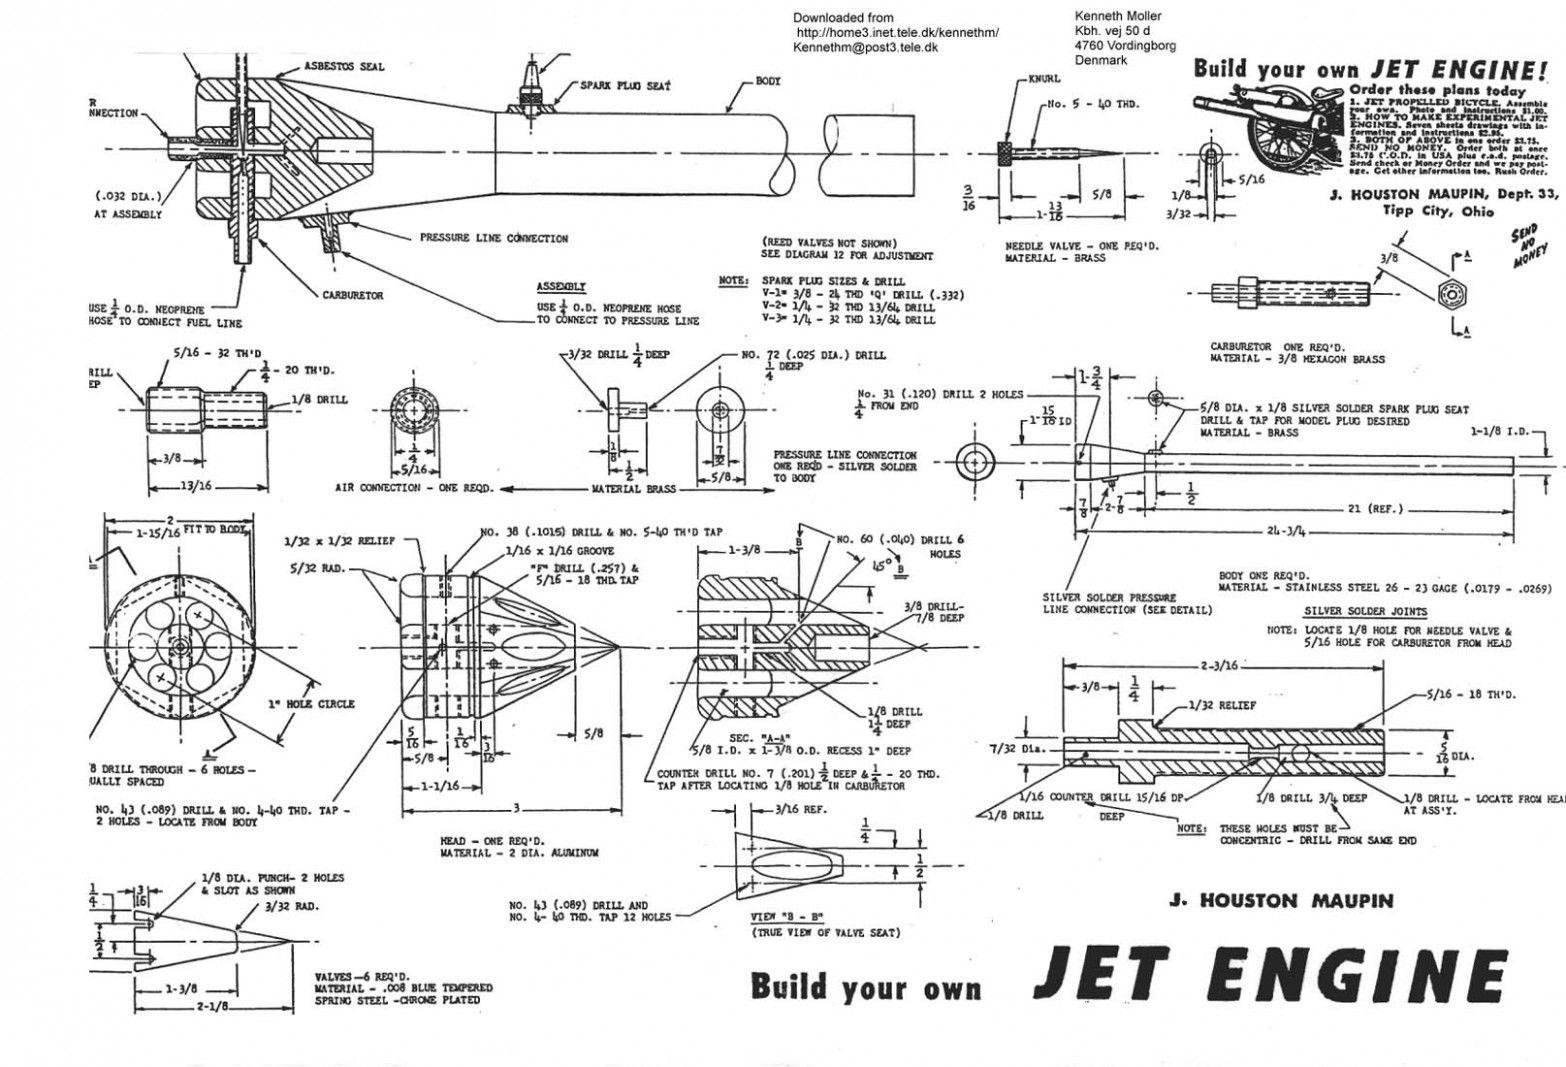 Engine Turbofan Diagram Pdf di 2020